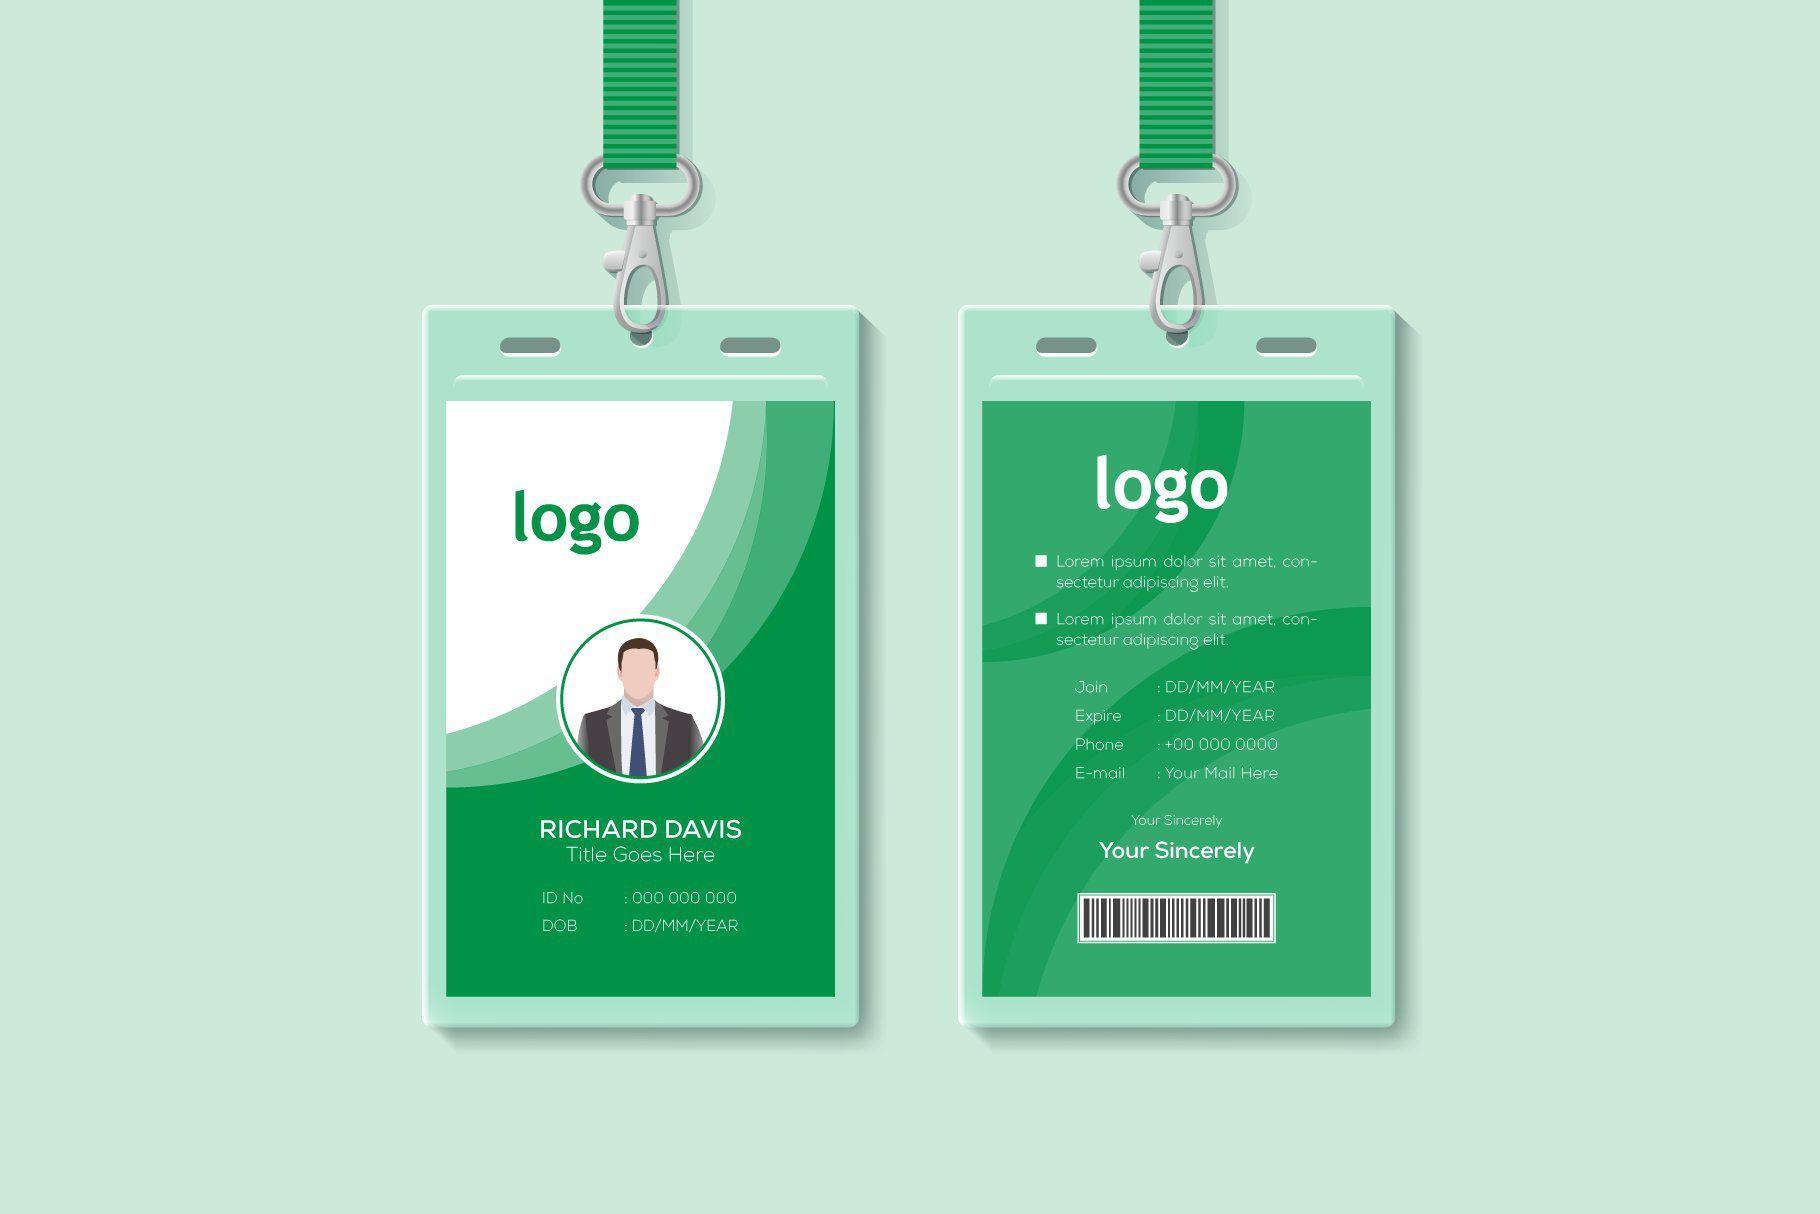 001 Unbelievable Employee Id Card Template Idea  Free Download Psd WordFull